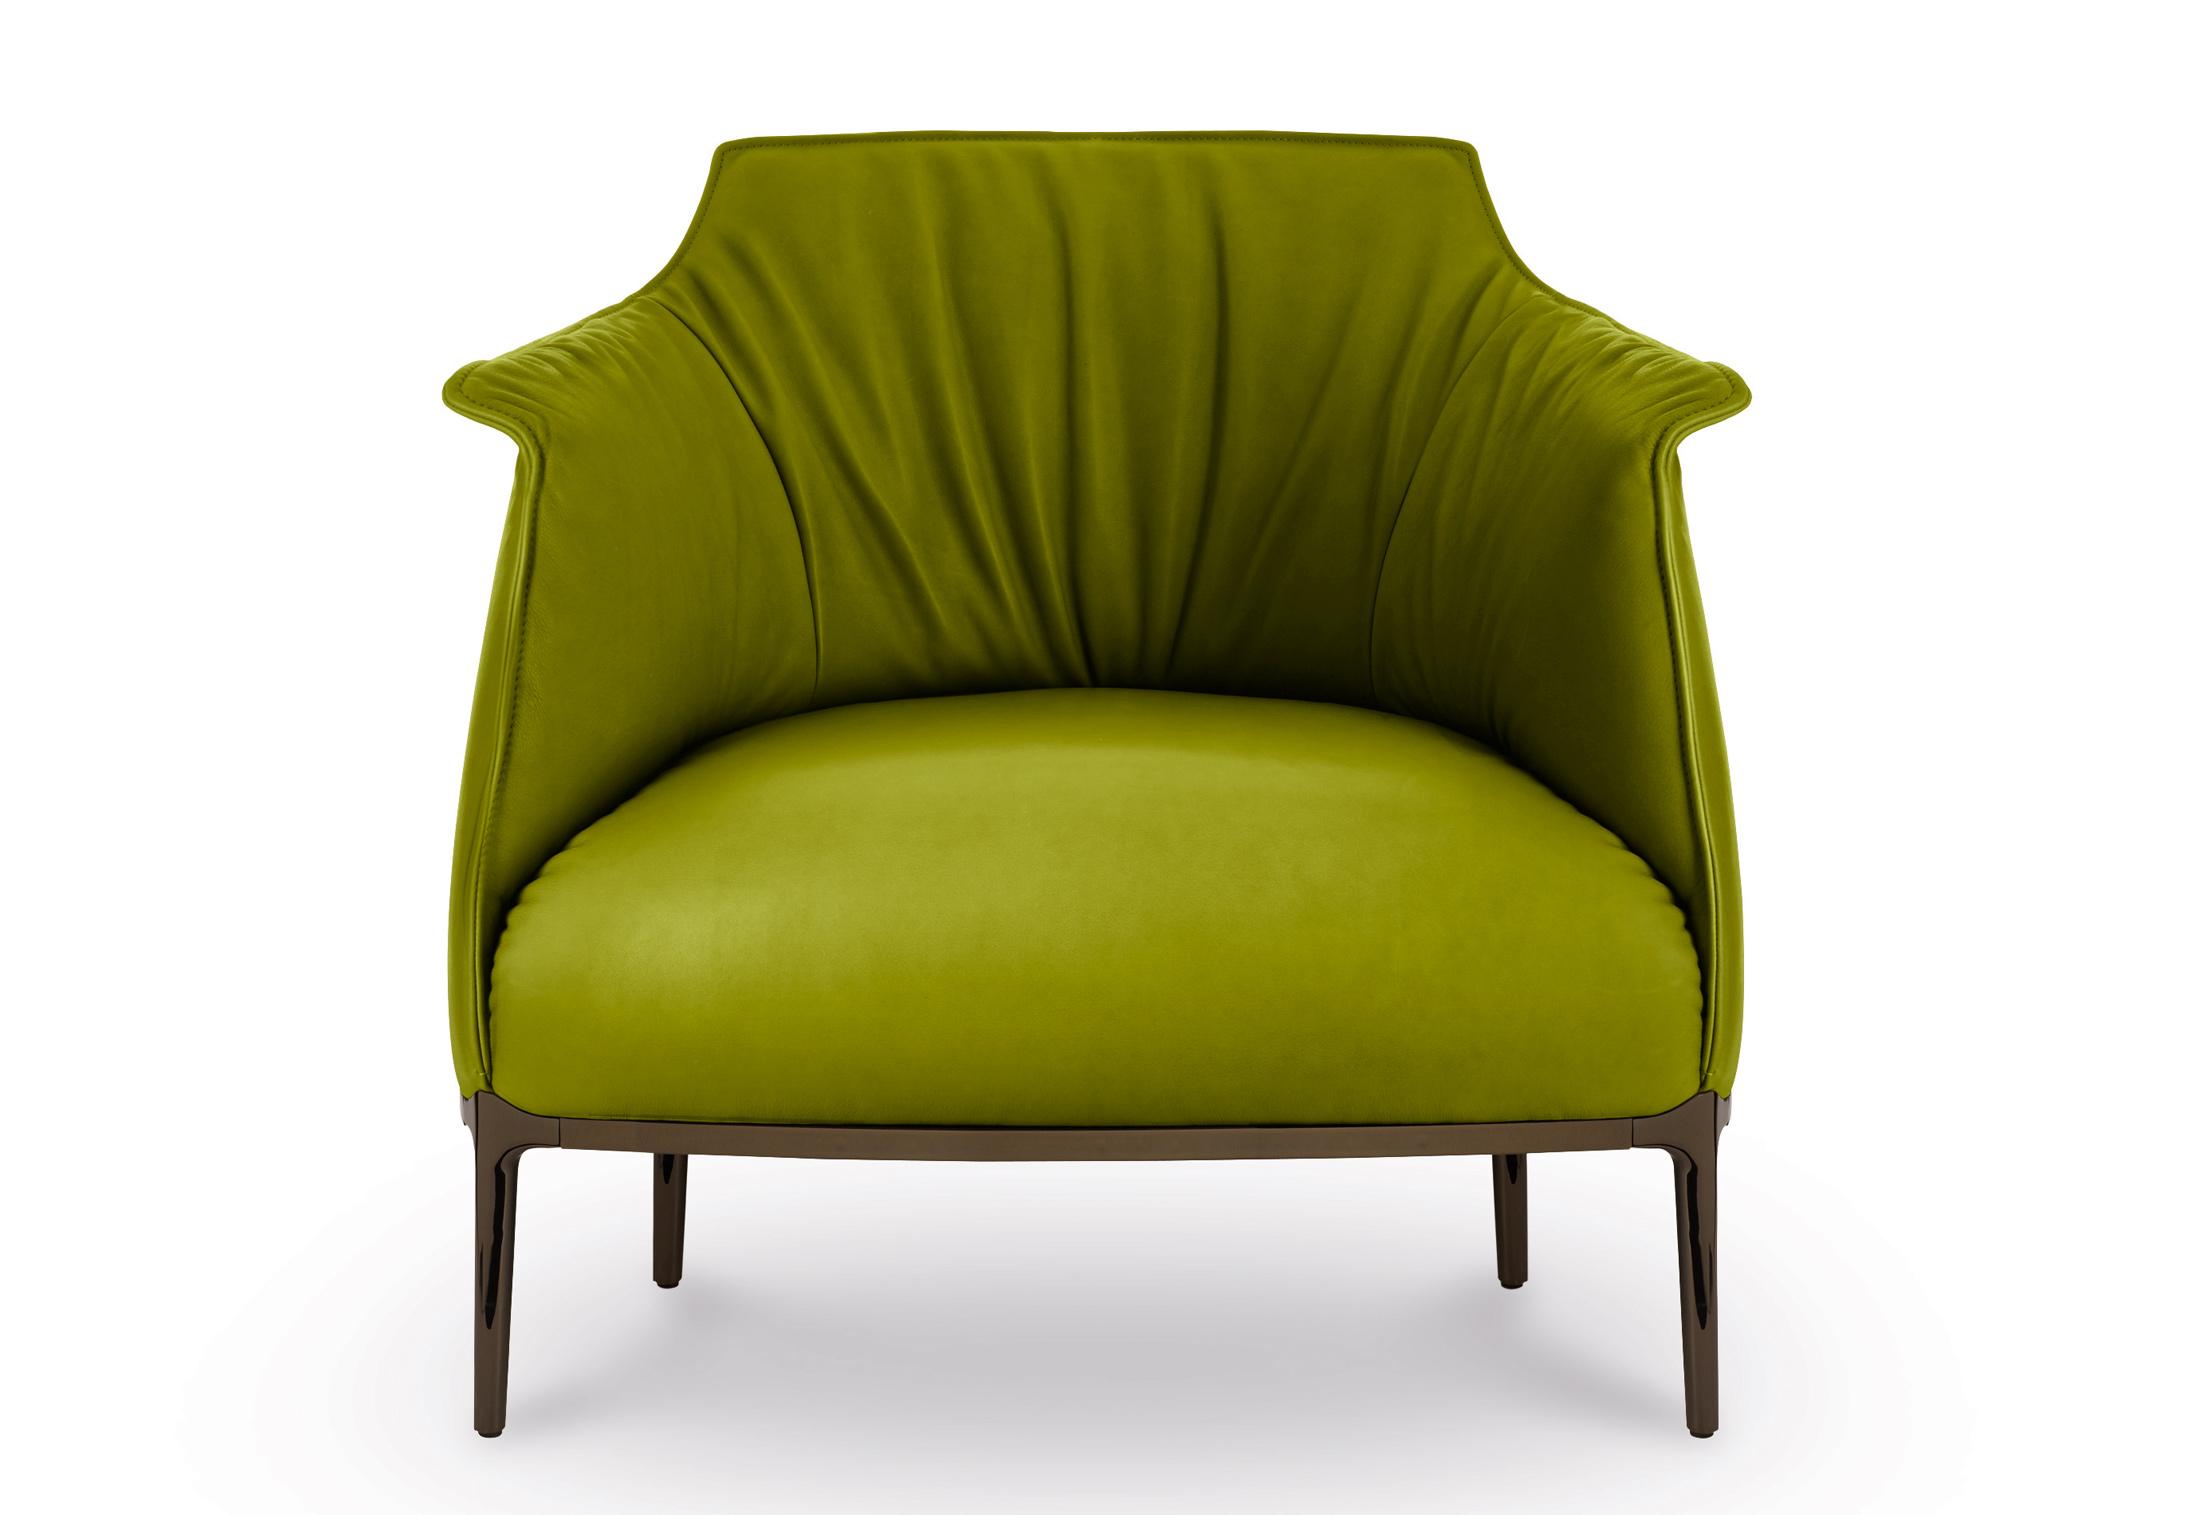 archibald armchair by poltrona frau stylepark. Black Bedroom Furniture Sets. Home Design Ideas